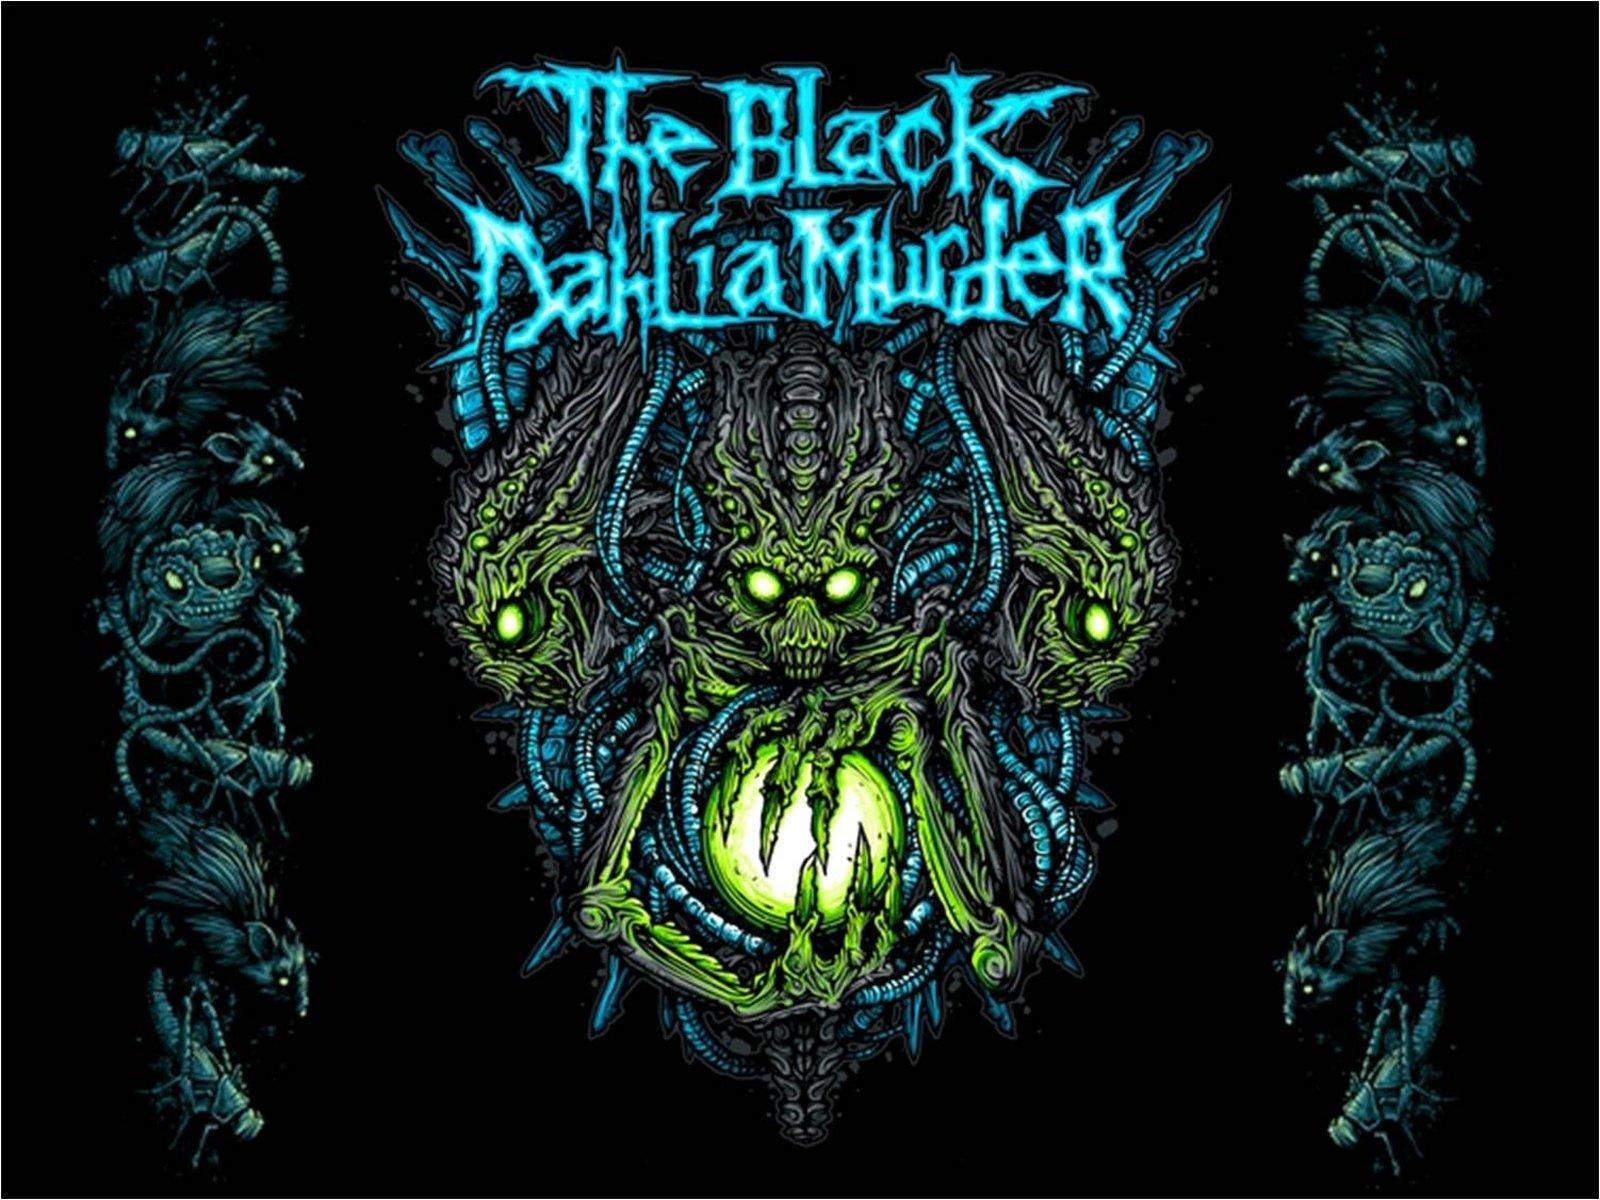 High Resolution Wallpaper | The Black Dahlia Murder 1600x1200 px